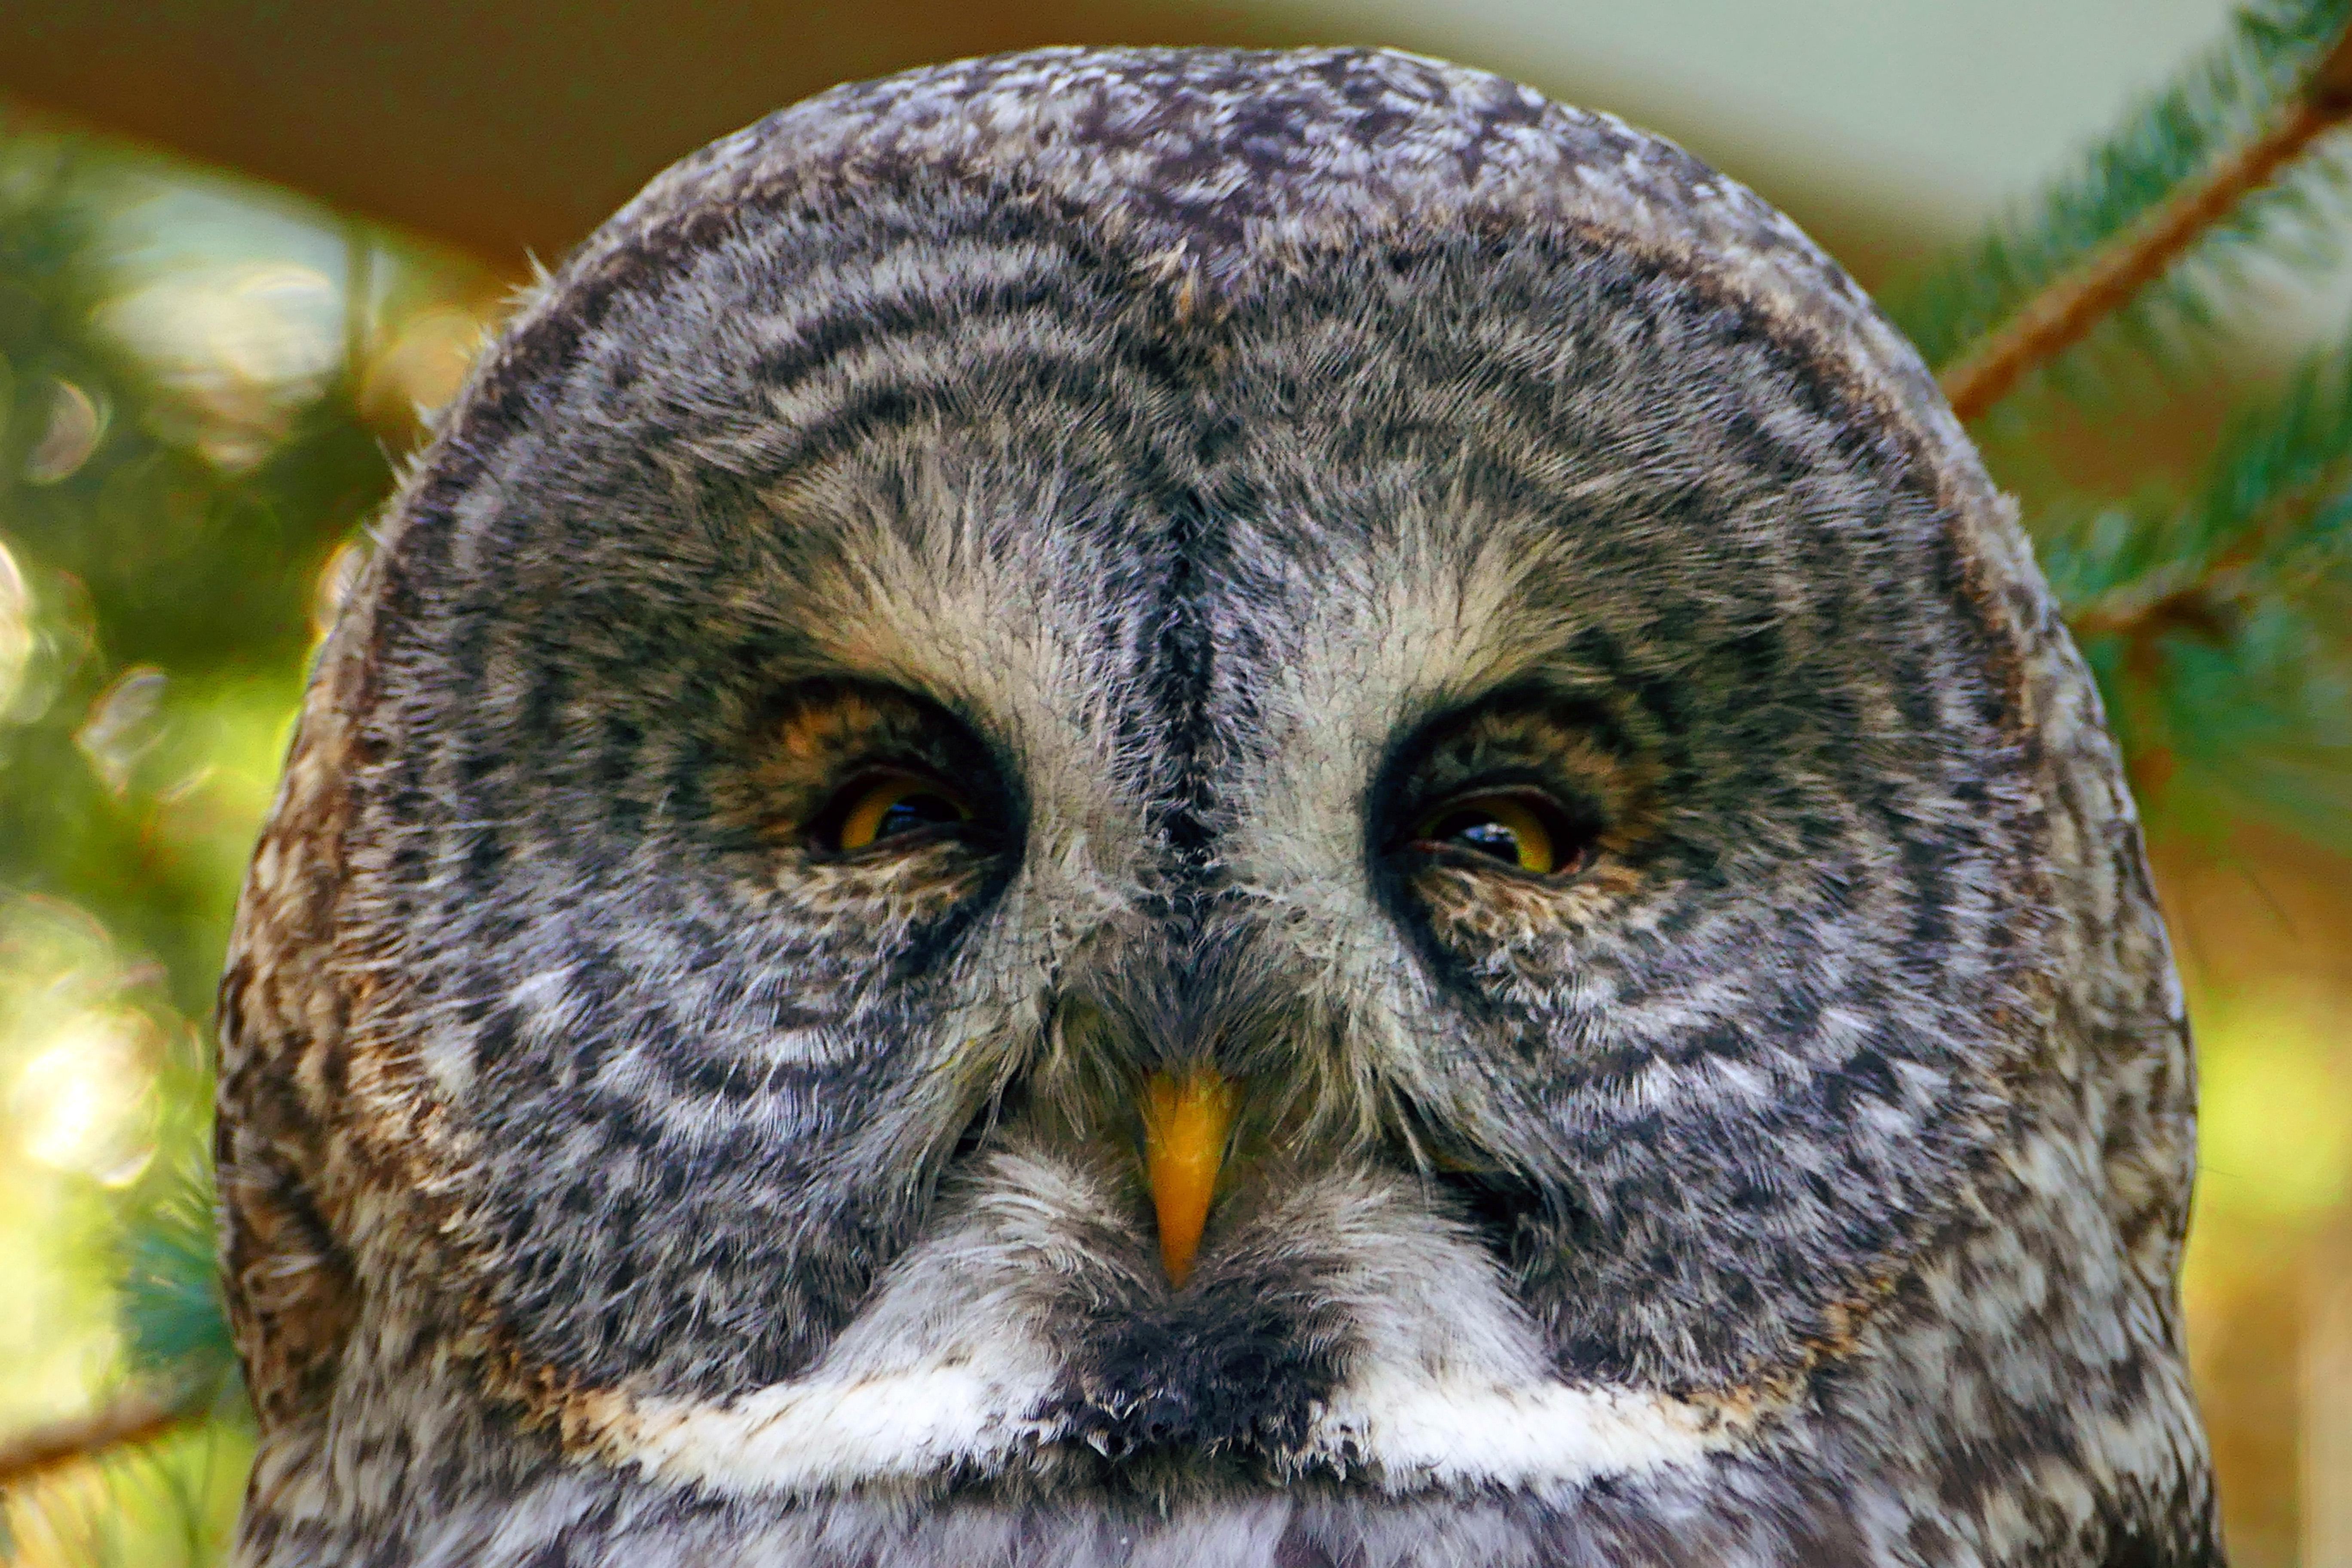 Great Grey Owl face image - Free stock photo - Public ...